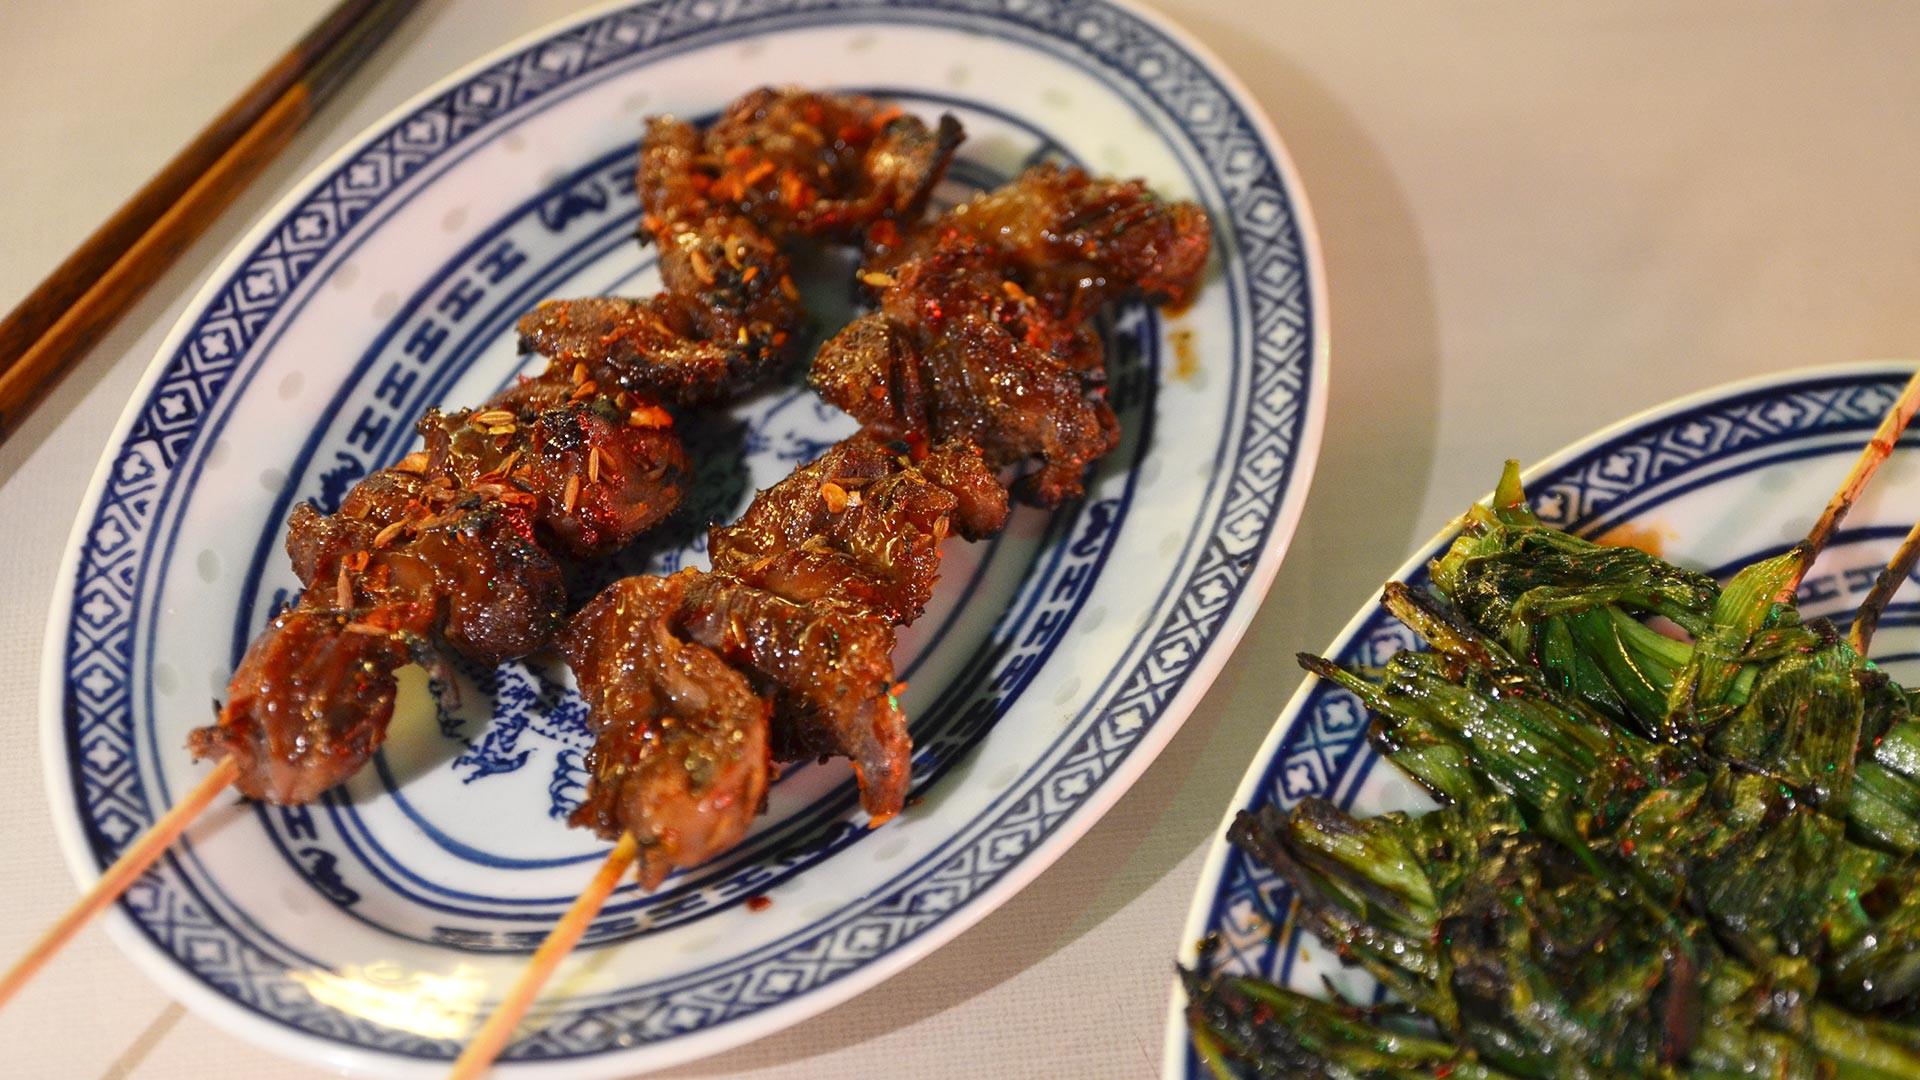 Chicken gizzard coal grilled skewers